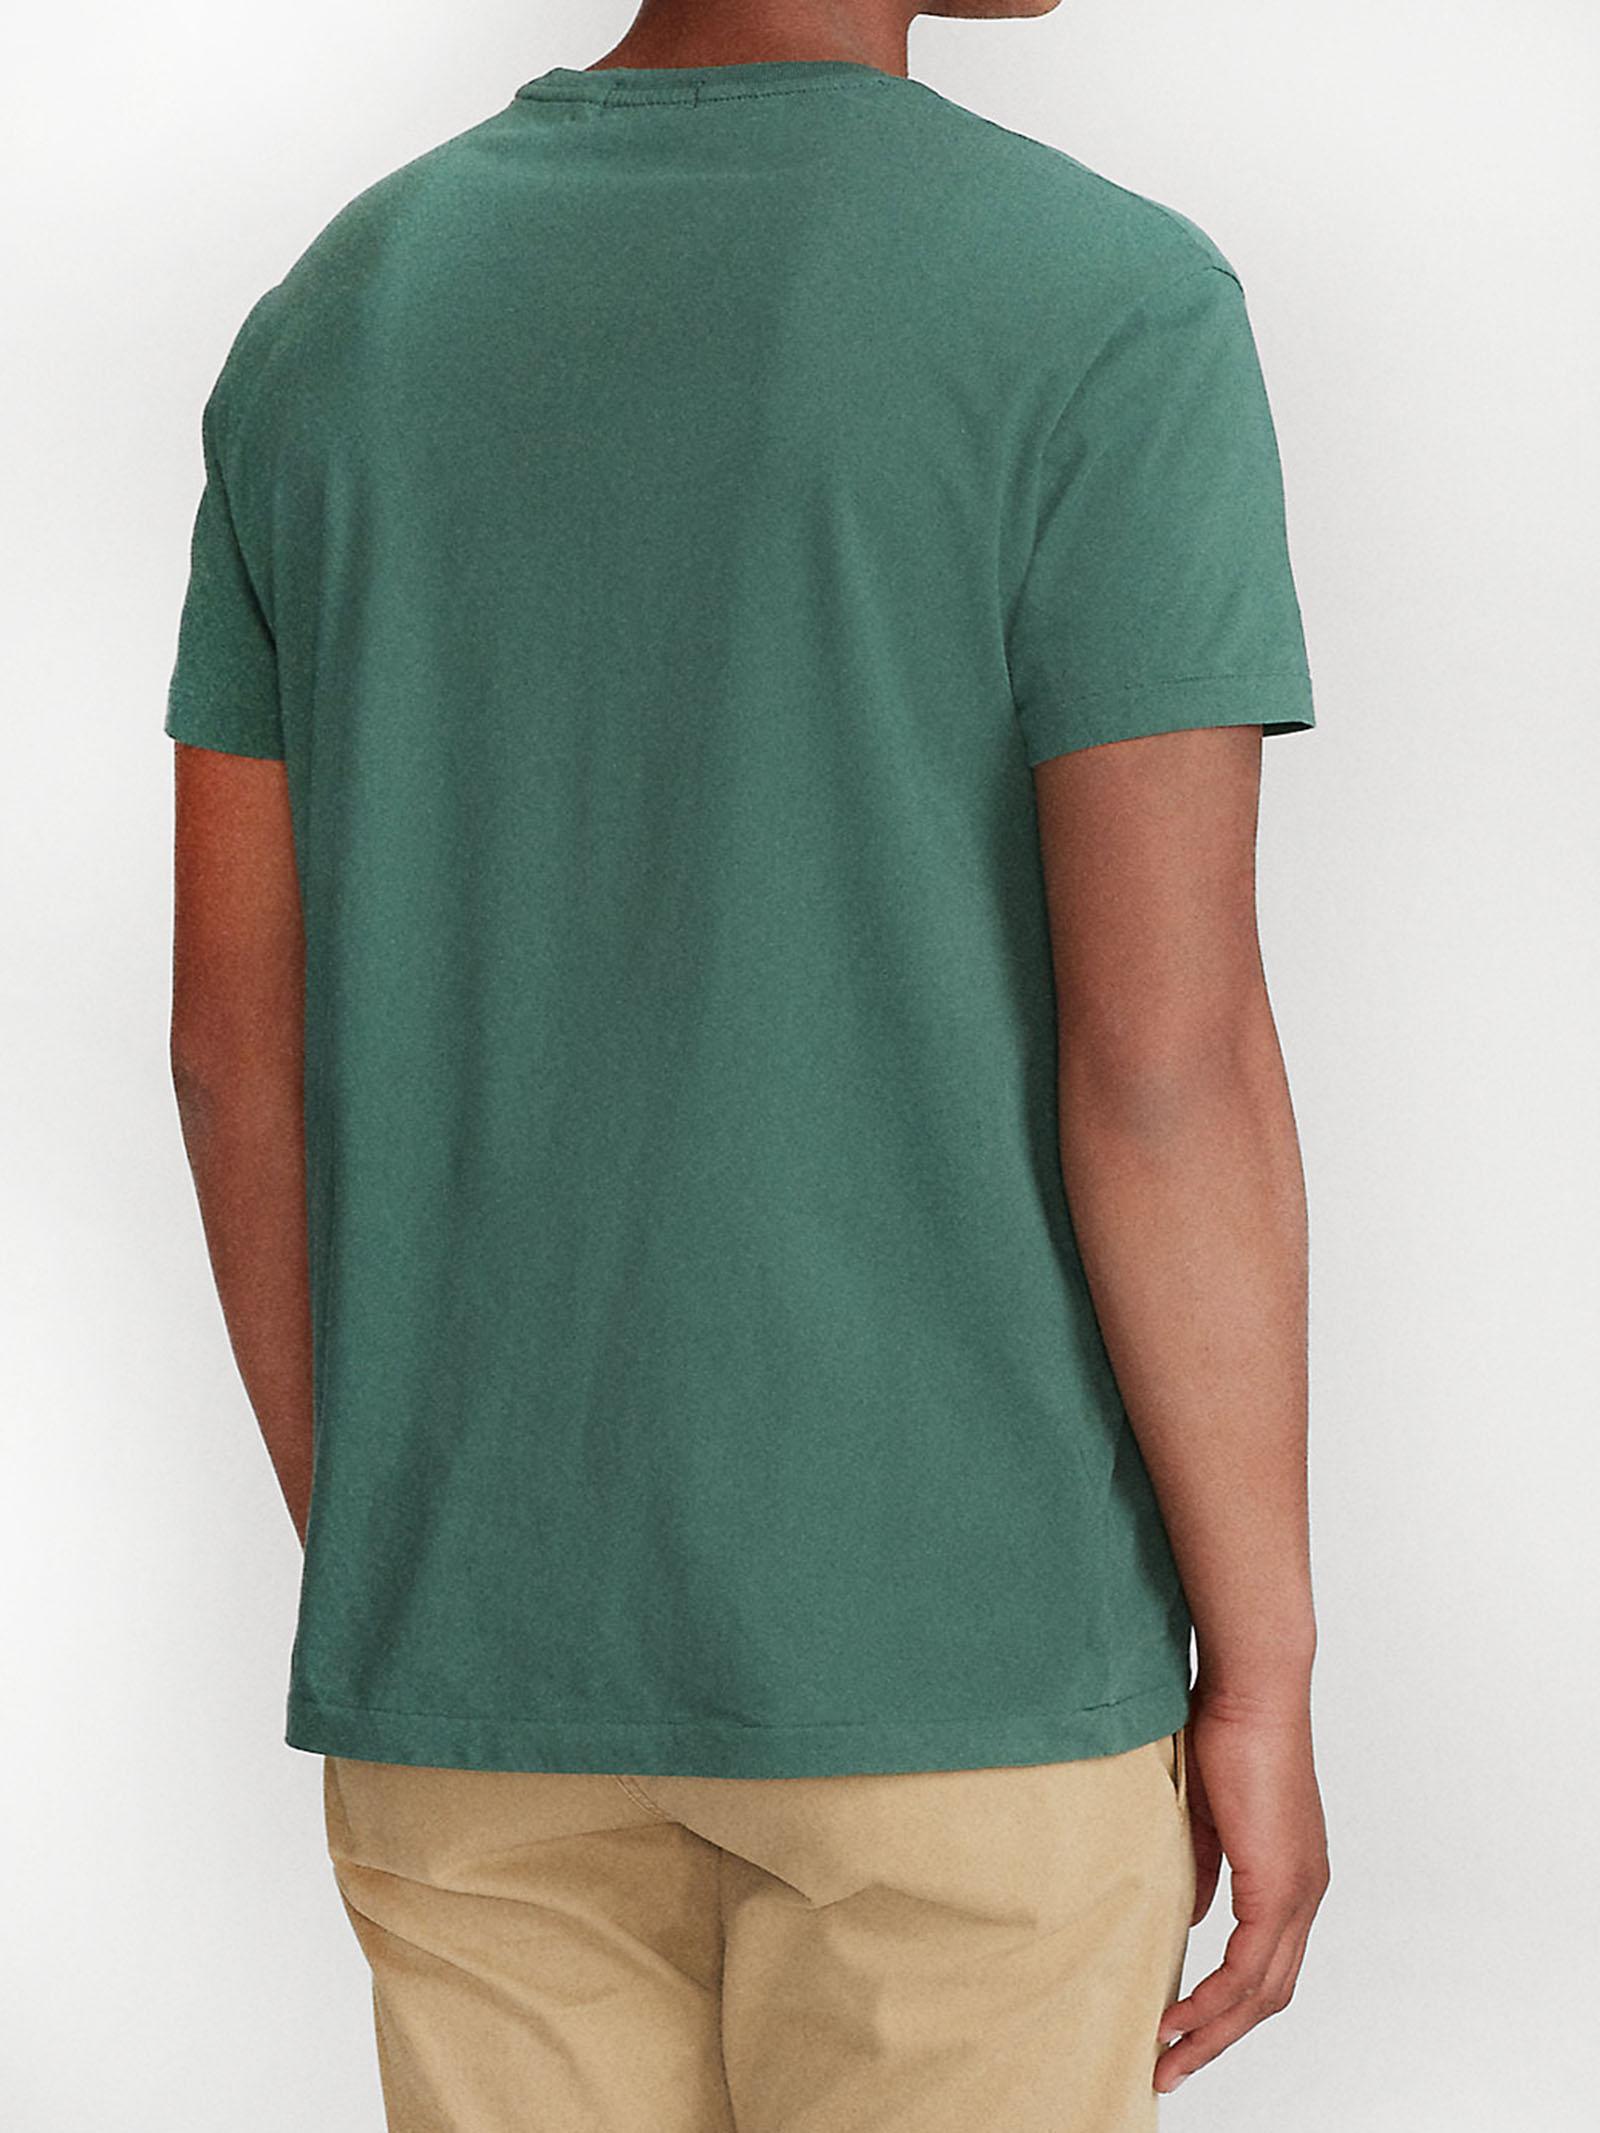 T-shirt Polo Bear Custom Slim-Fit RALPH LAUREN | T-shirt | 710-835761003